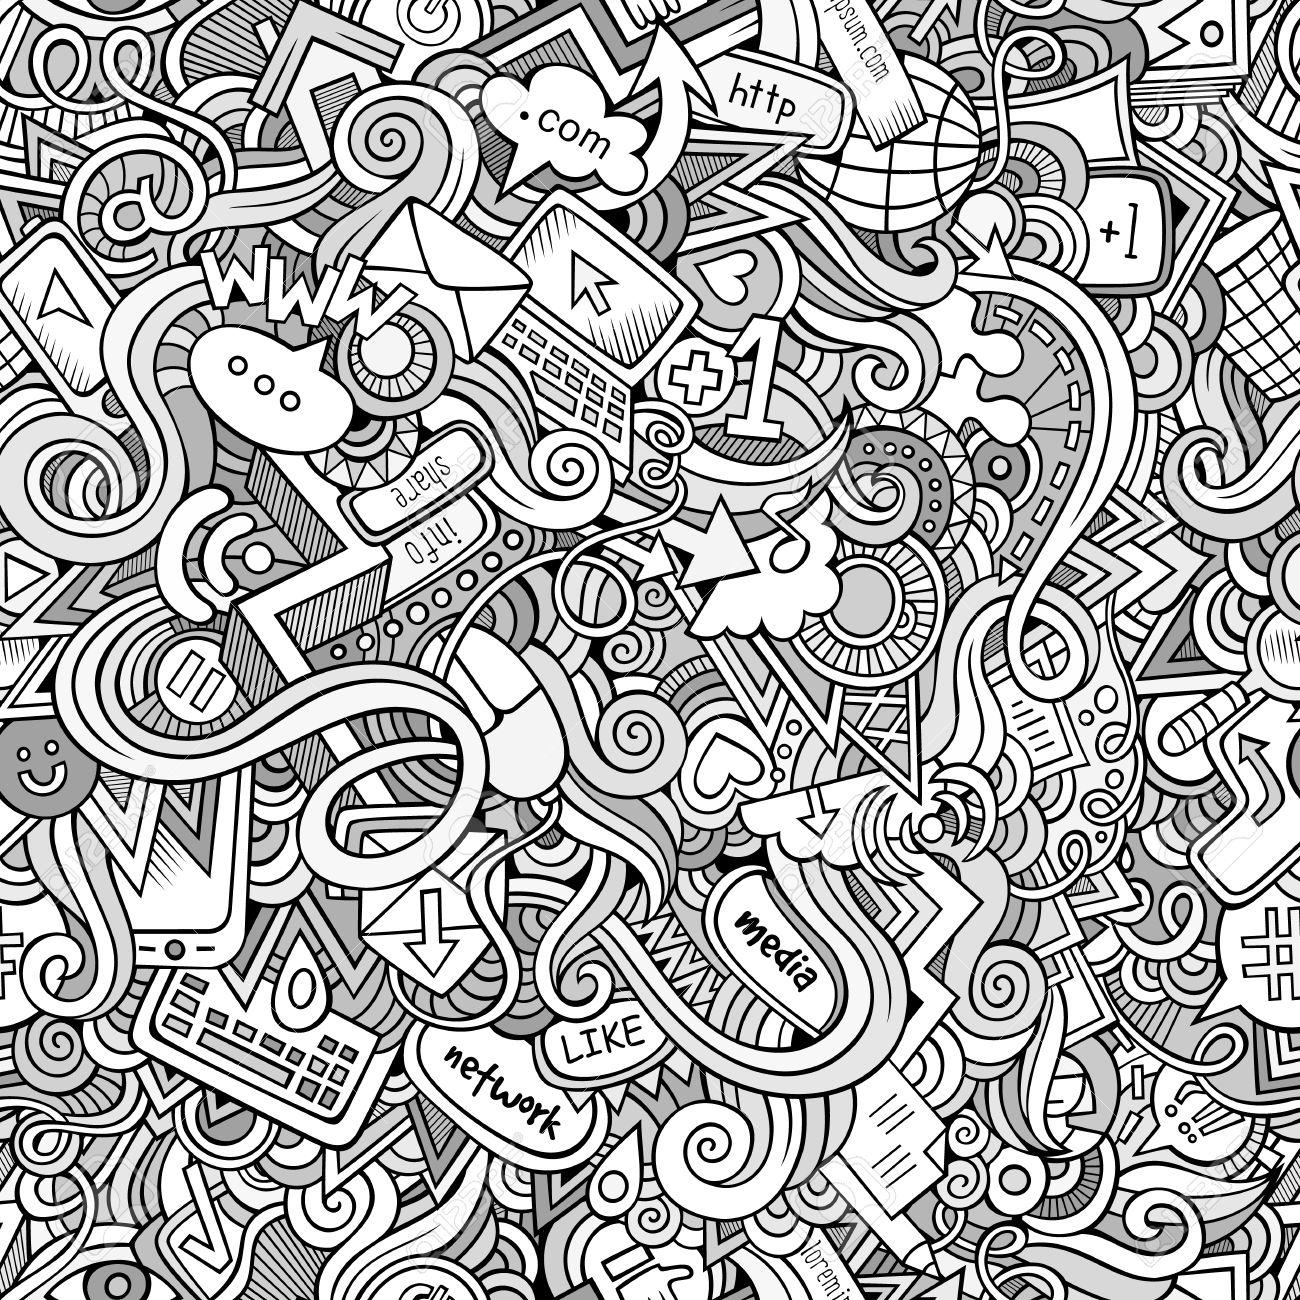 1300x1300 Cartoon Doodles On The Subject Of Internet Social Media Theme